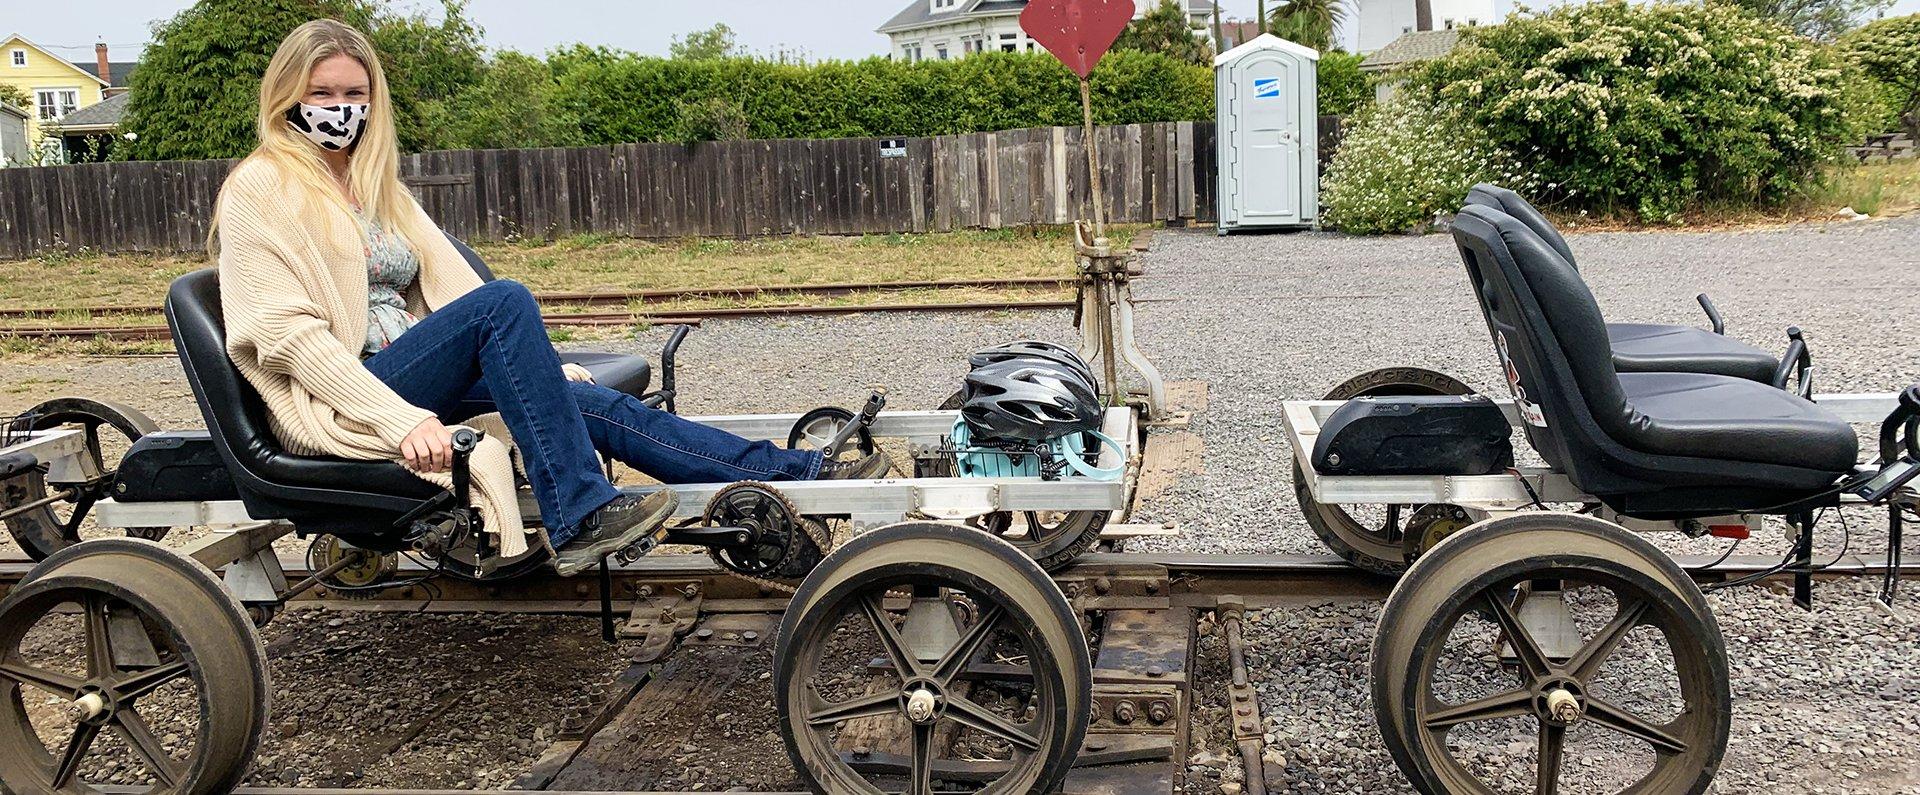 The Railbikes at the Skunk Train Offer a Unique Adventure